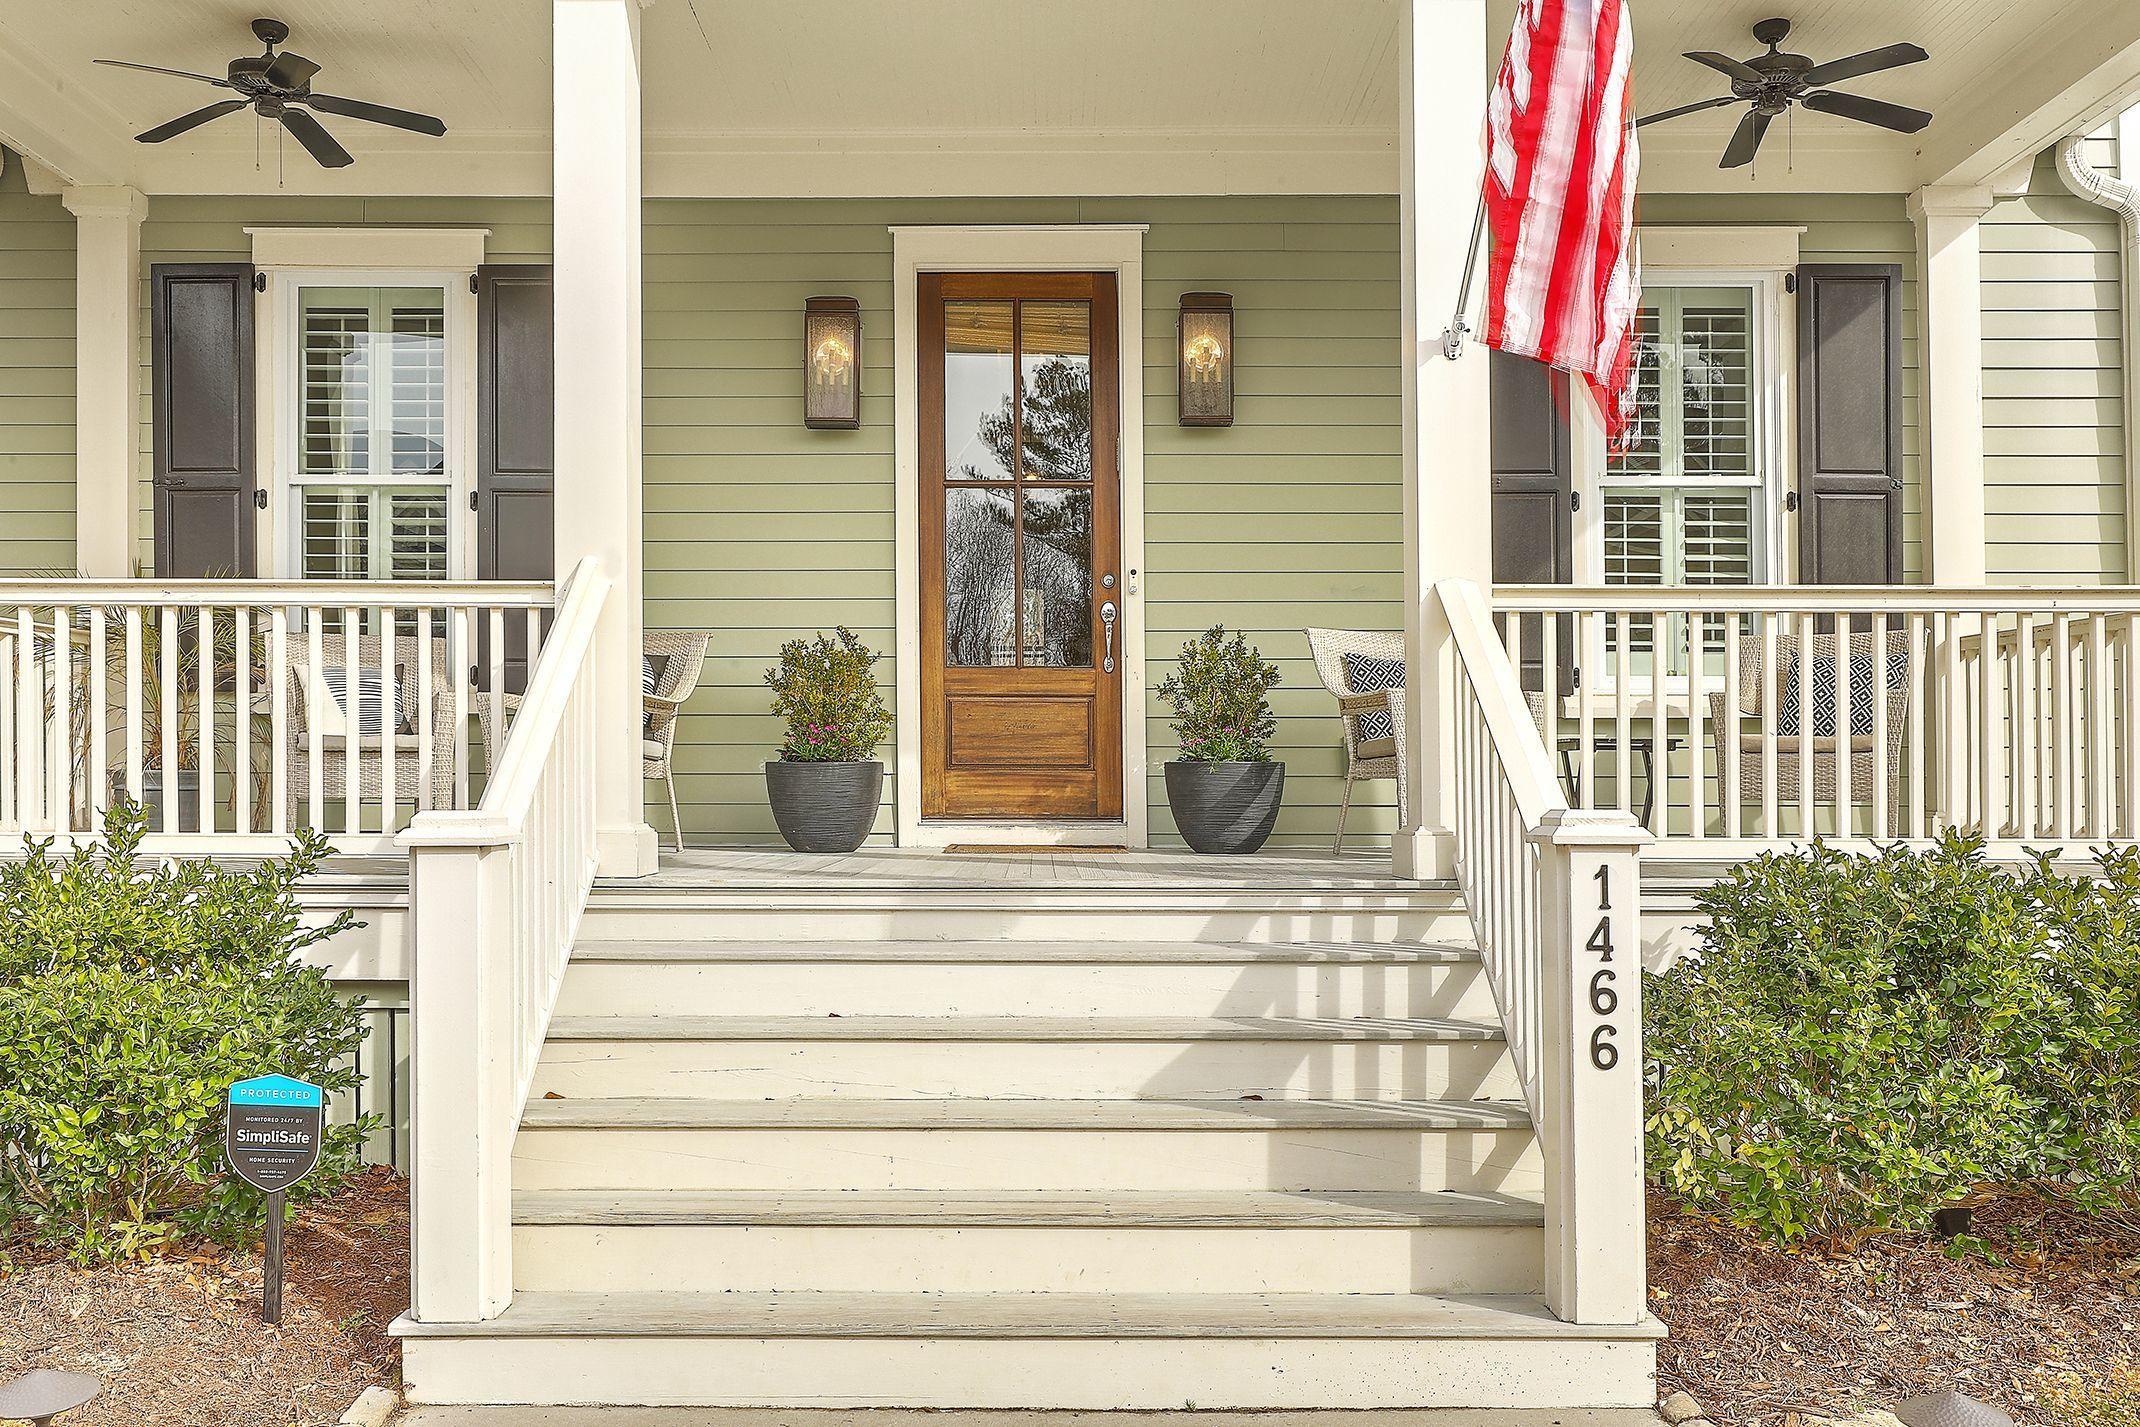 Carolina Park Homes For Sale - 1466 Gunnison, Mount Pleasant, SC - 2